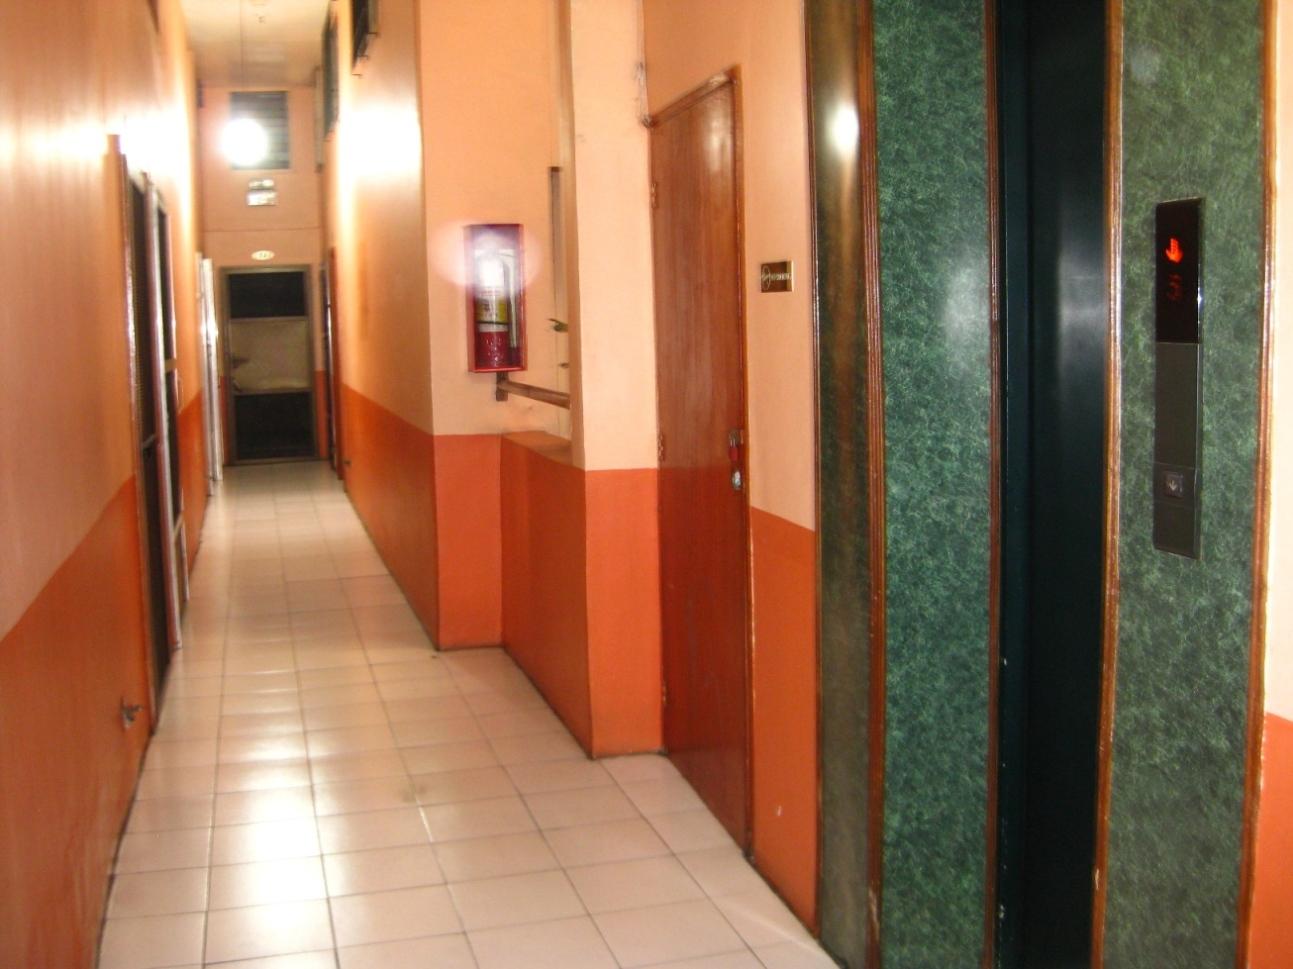 Elevator Lobby - http://www.renttoown.ph